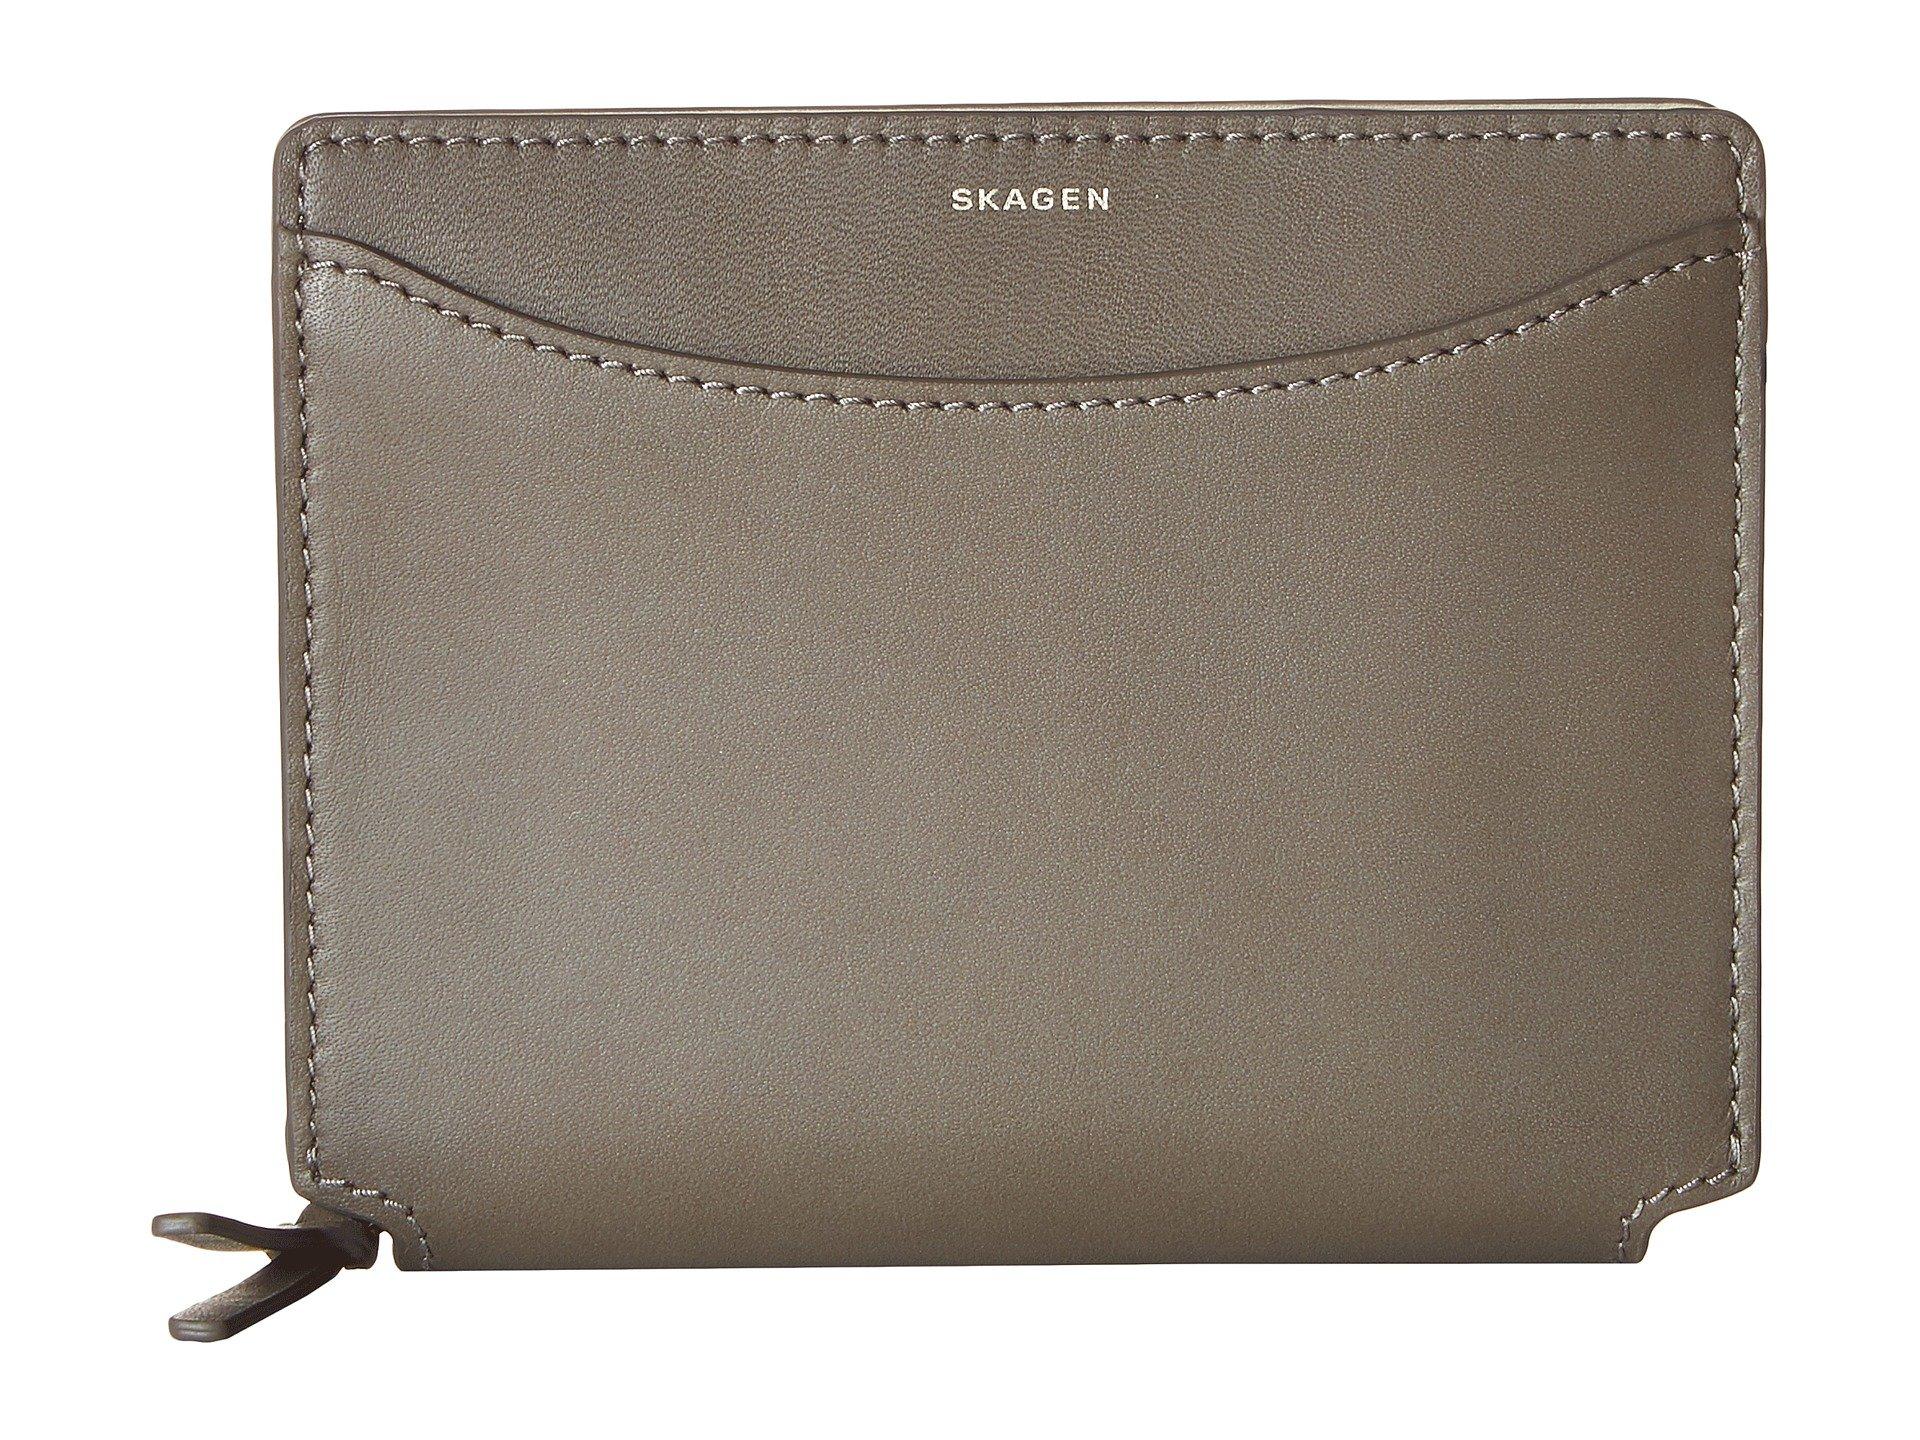 Monedero para Mujer Skagen Ryle Medium Zip Wallet  + Skagen en VeoyCompro.net